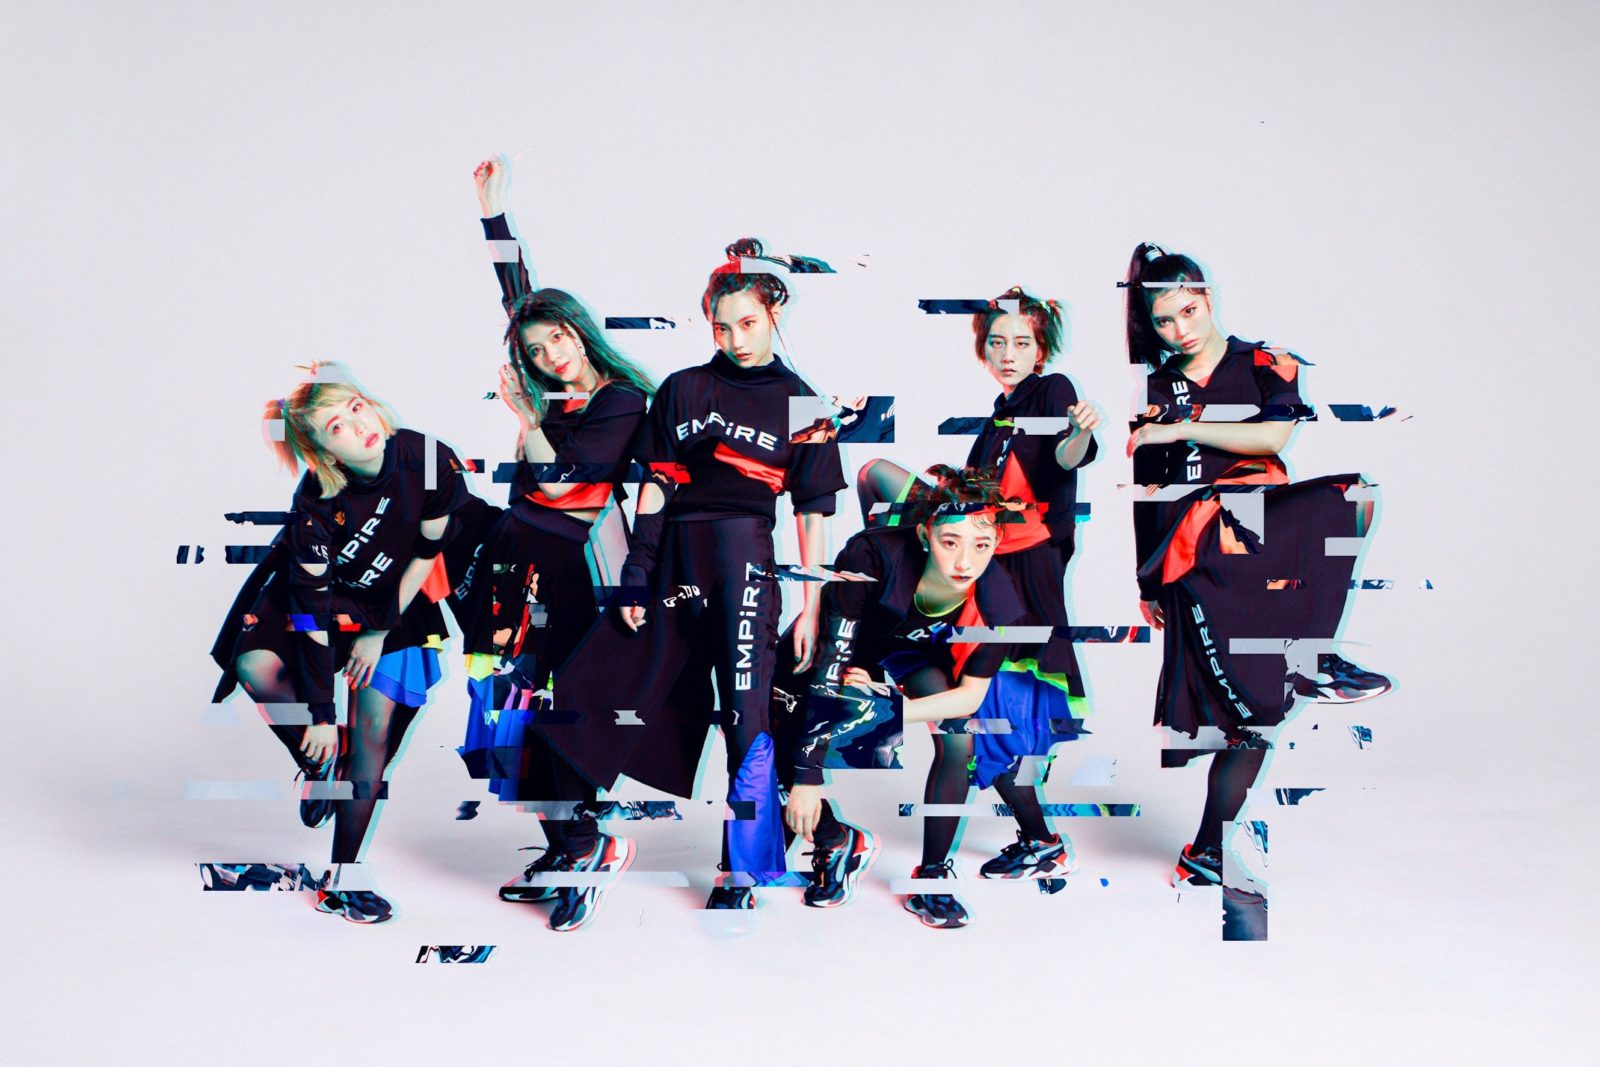 EMPiRE、7月23日に新作EP全曲先行視聴会「SUPER COOL EP LiSTENiG PARTY!!」をYouTubeプレミア公開で開催サムネイル画像